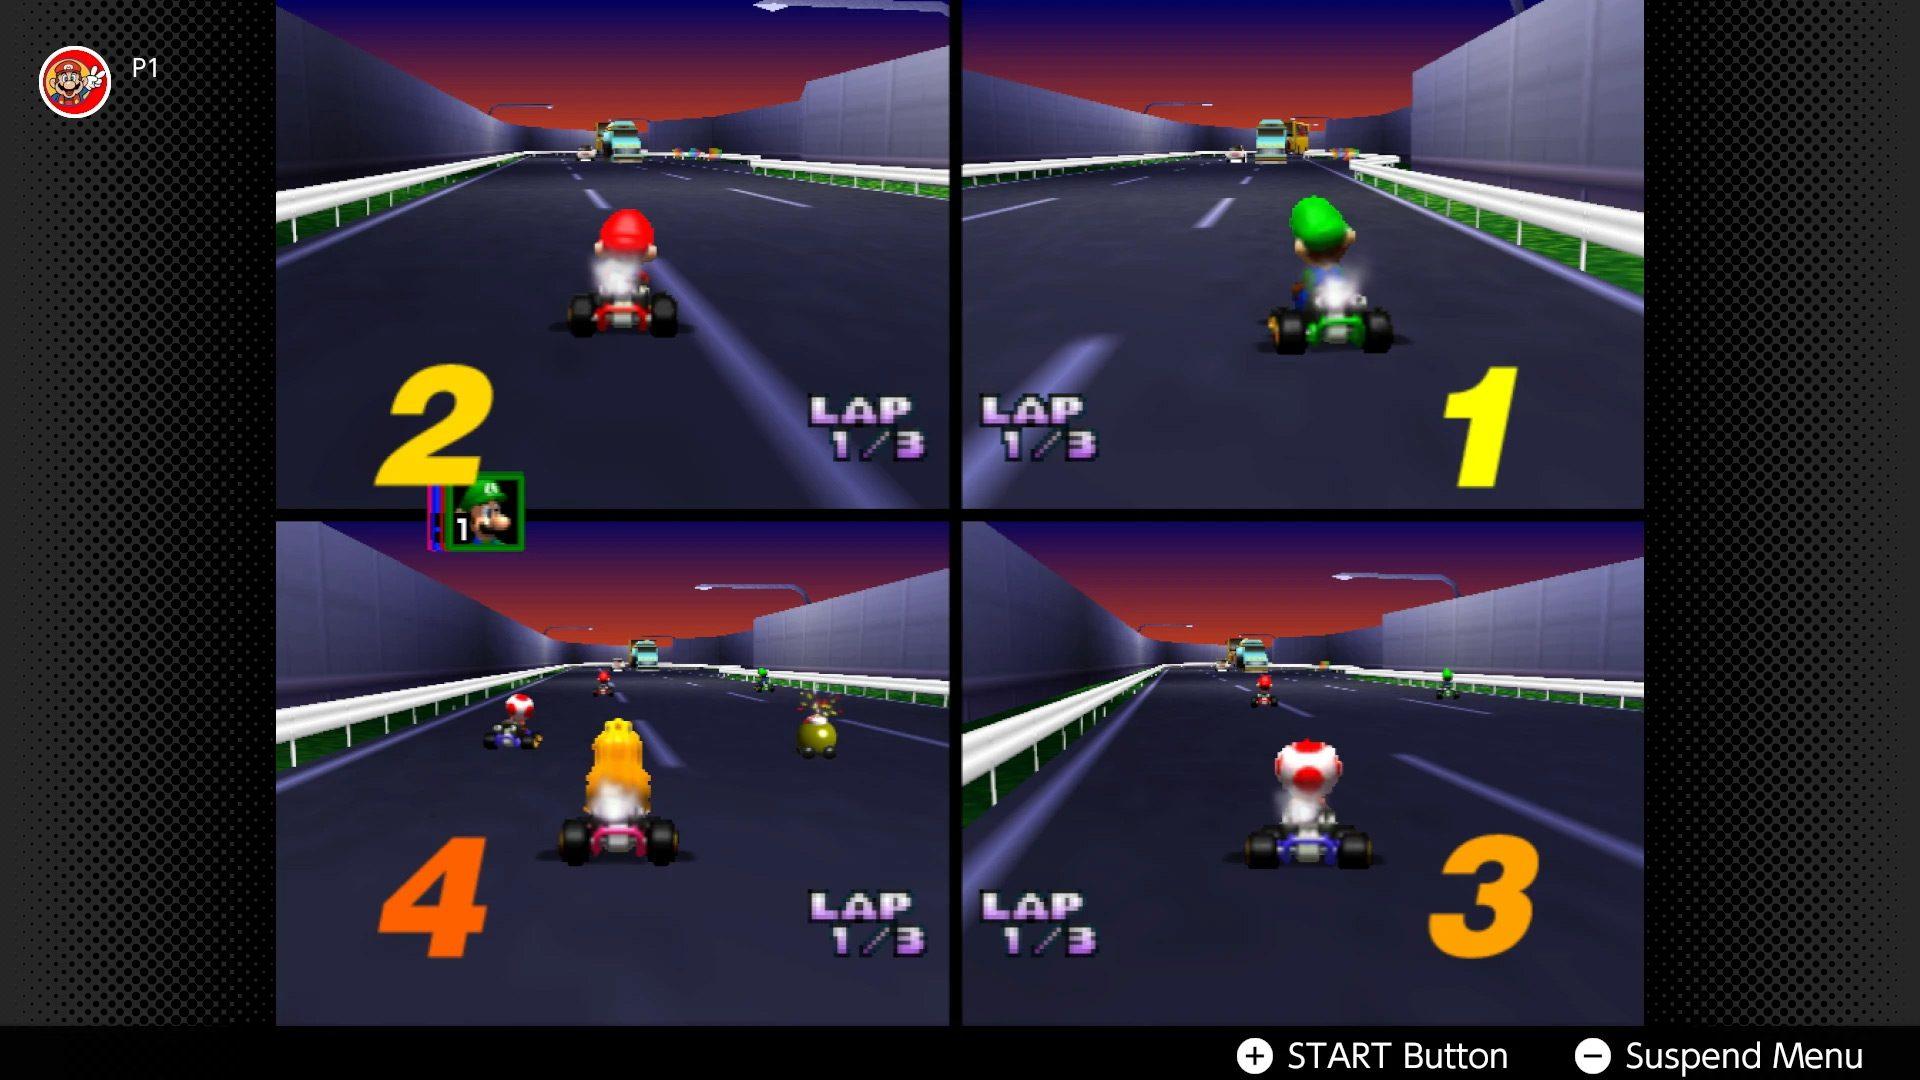 Mario Kart 64 online multiplayer with Nintendo Switch Online